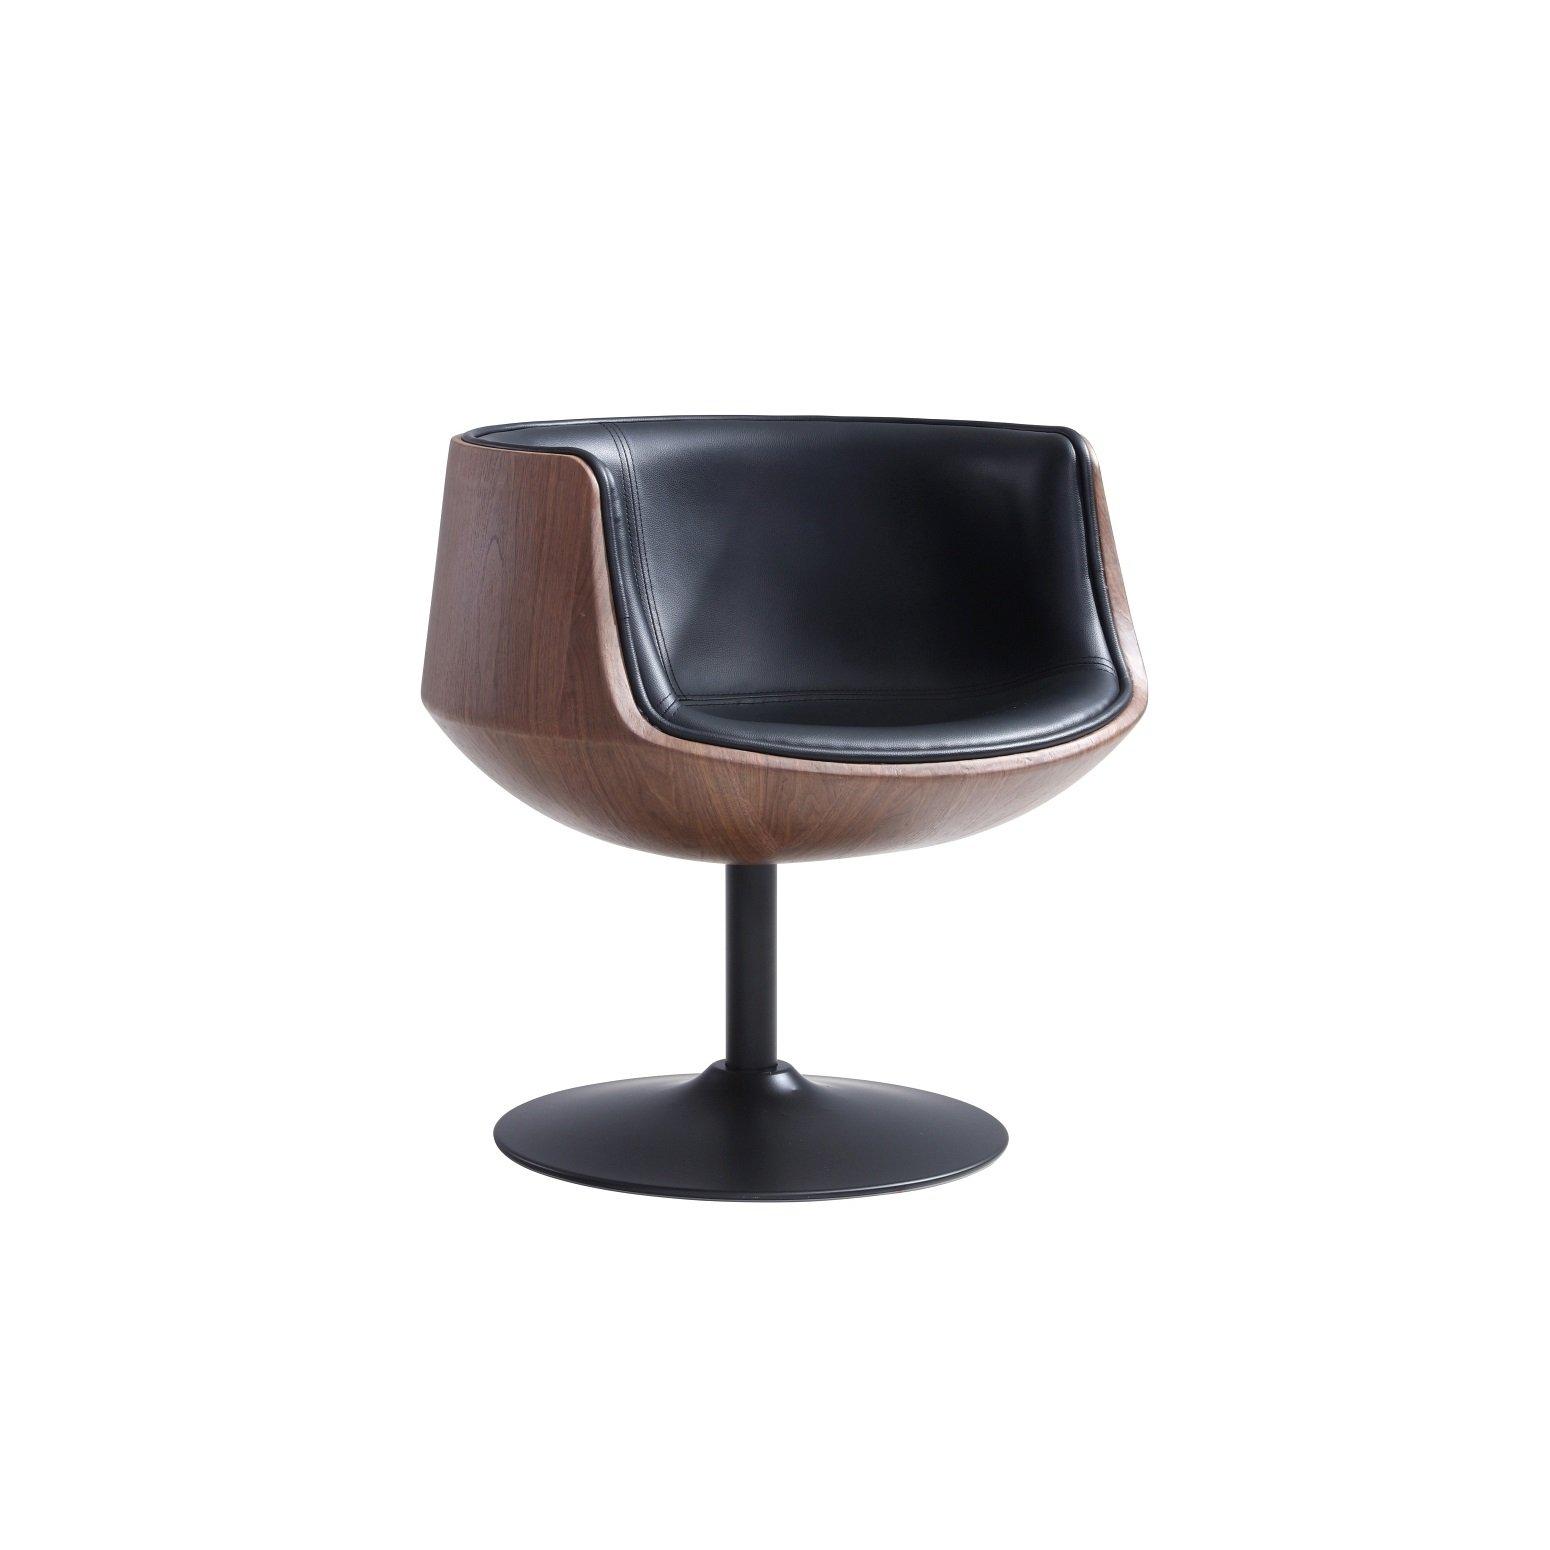 Conan pu swivel chair chair modern swivel chair swivel